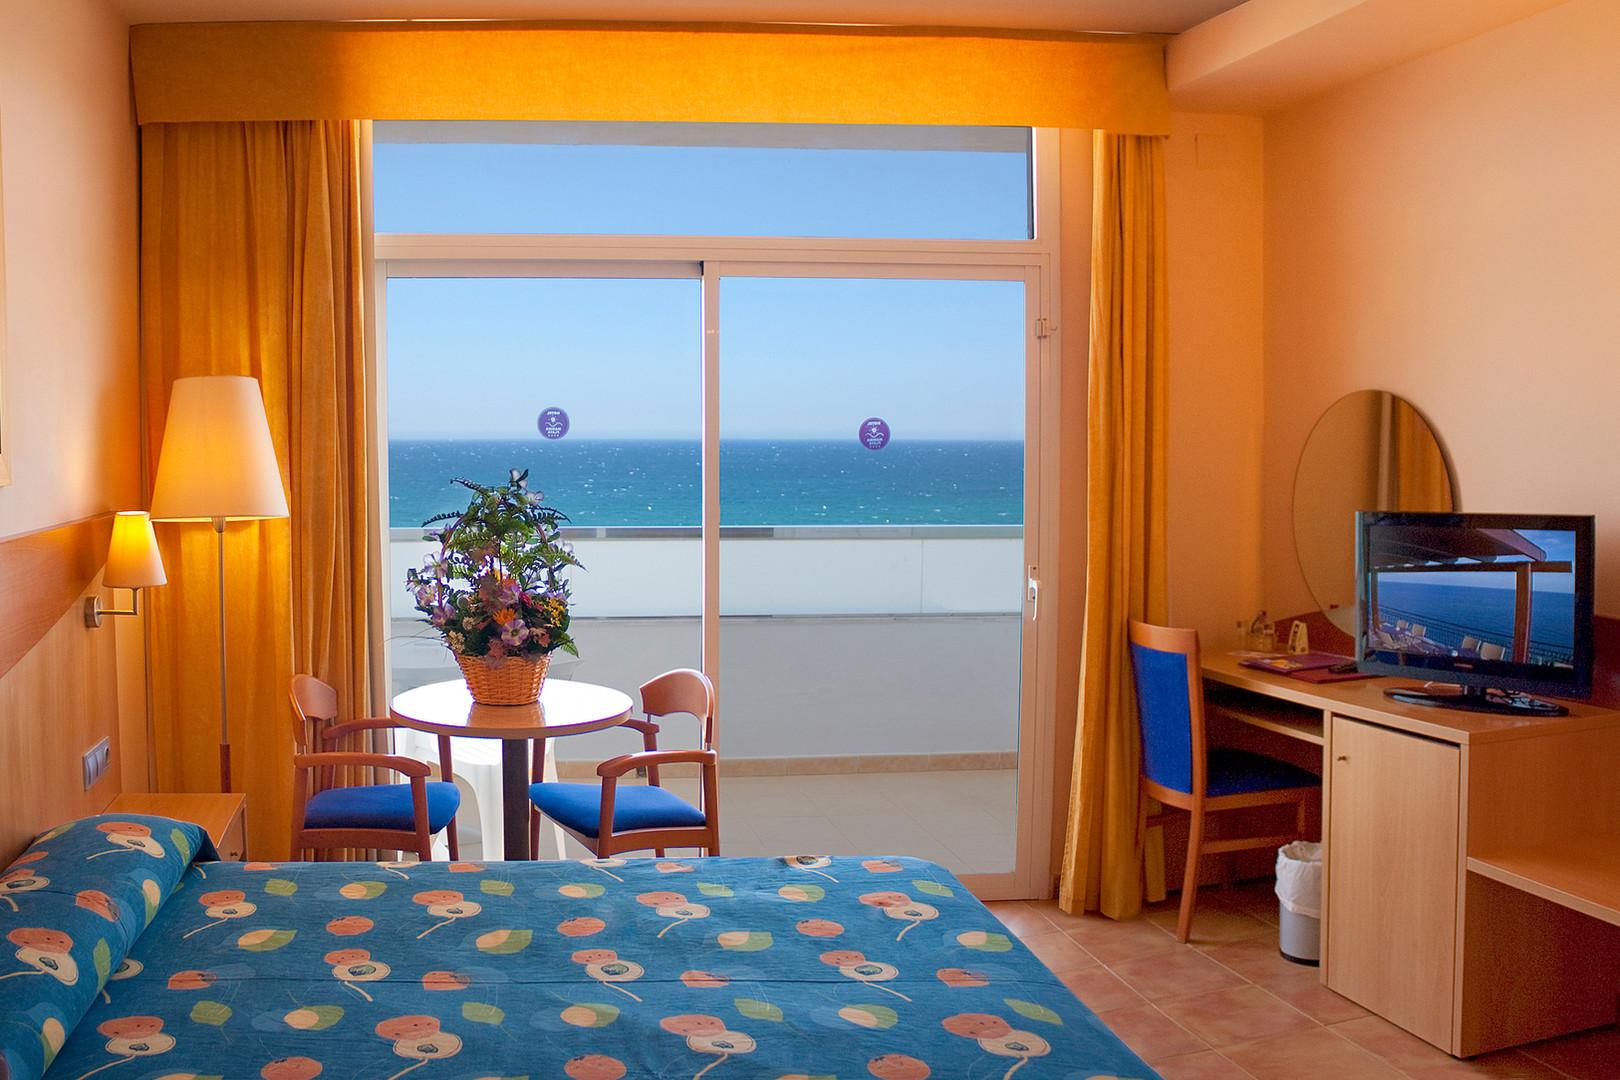 Chambre de l'hôtel Marina Playa - Marina Playa Hotelkamer